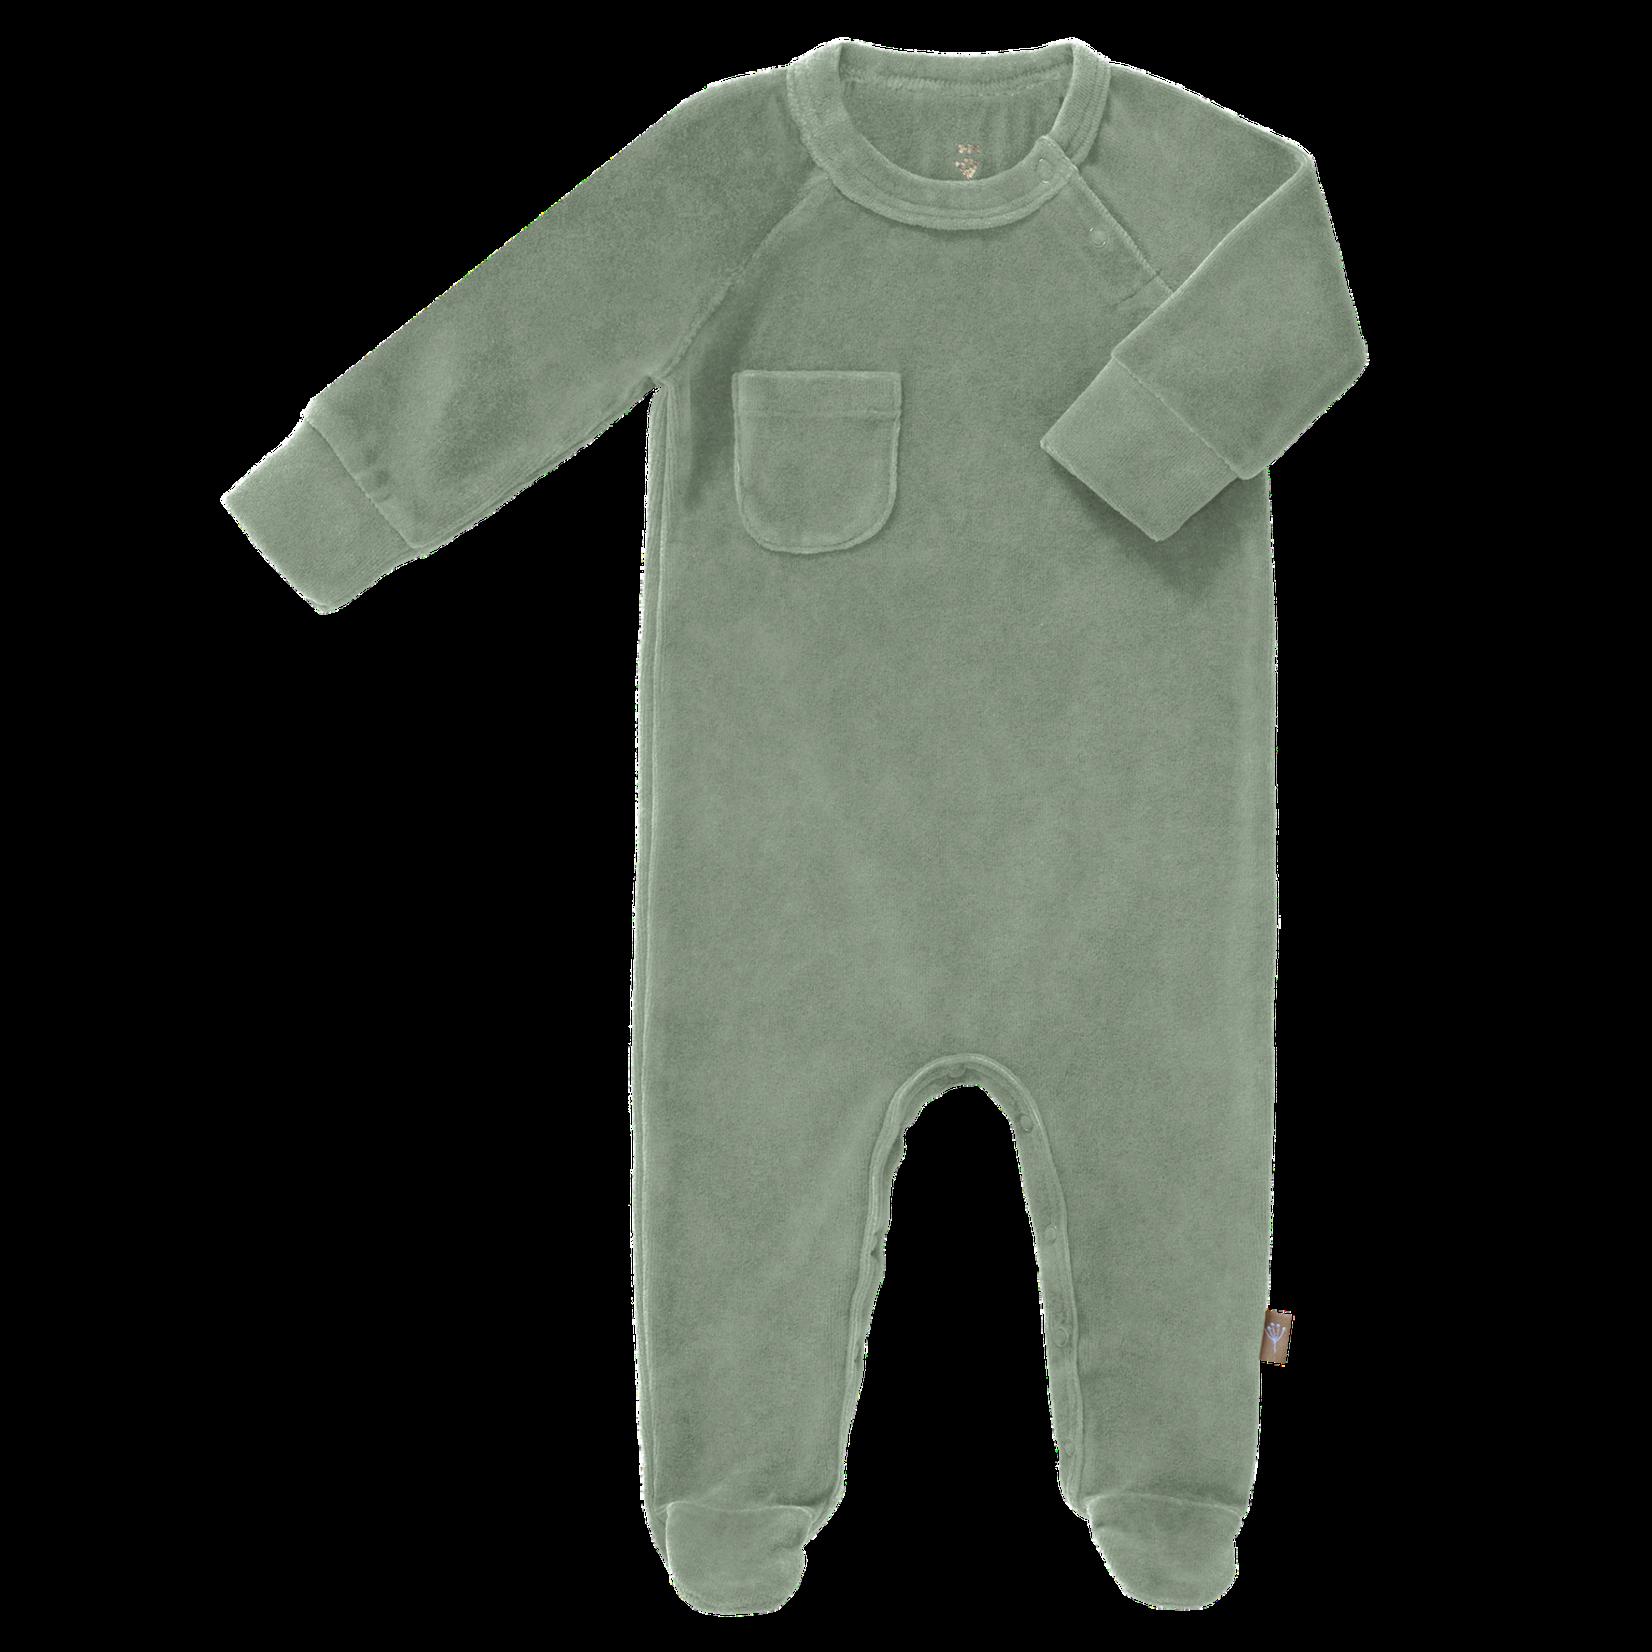 Fresk Pyjama velours met voet (Forest green)